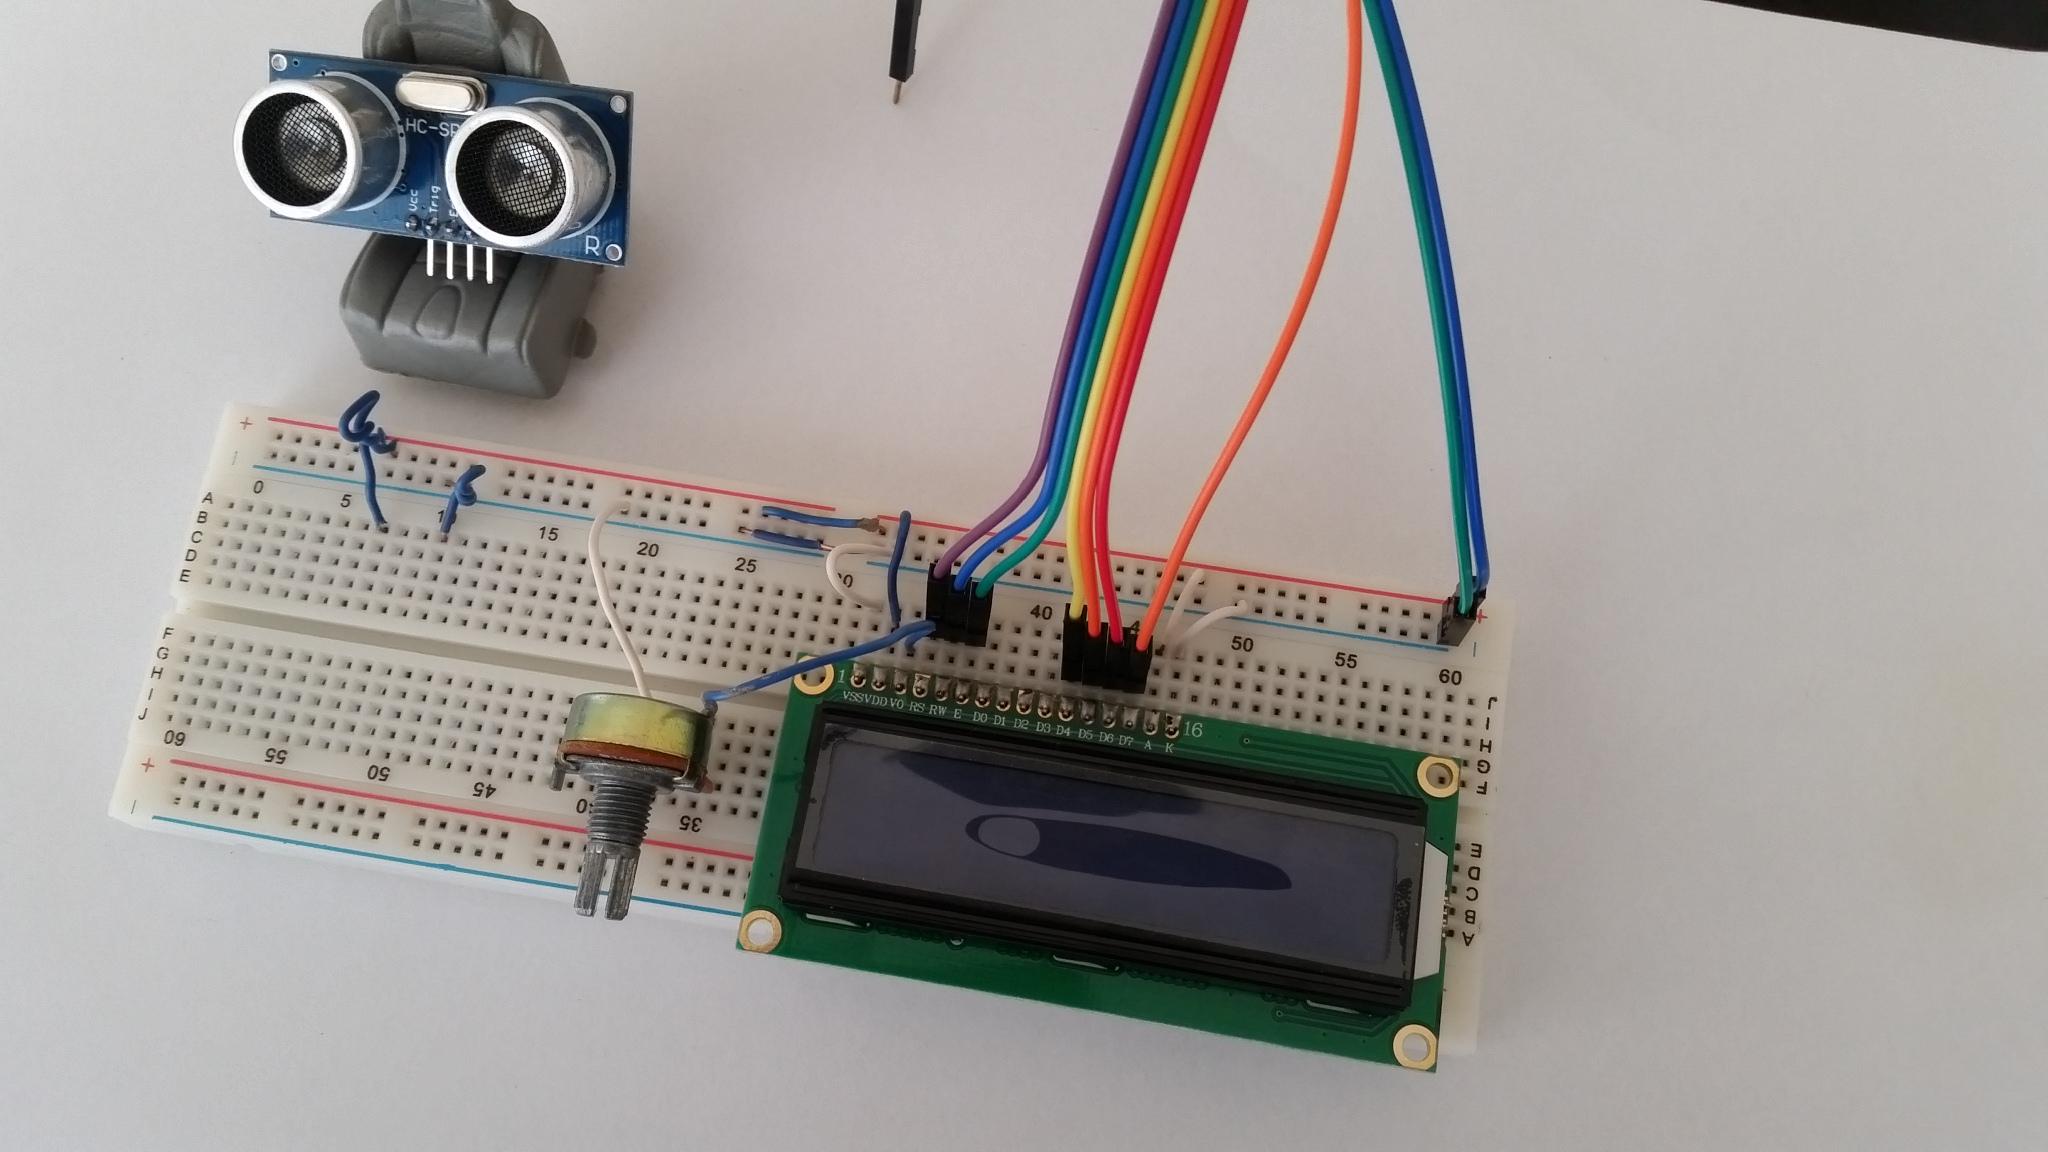 Arduino uno ile hc sr ve lcd ekran kullanarak mesafe